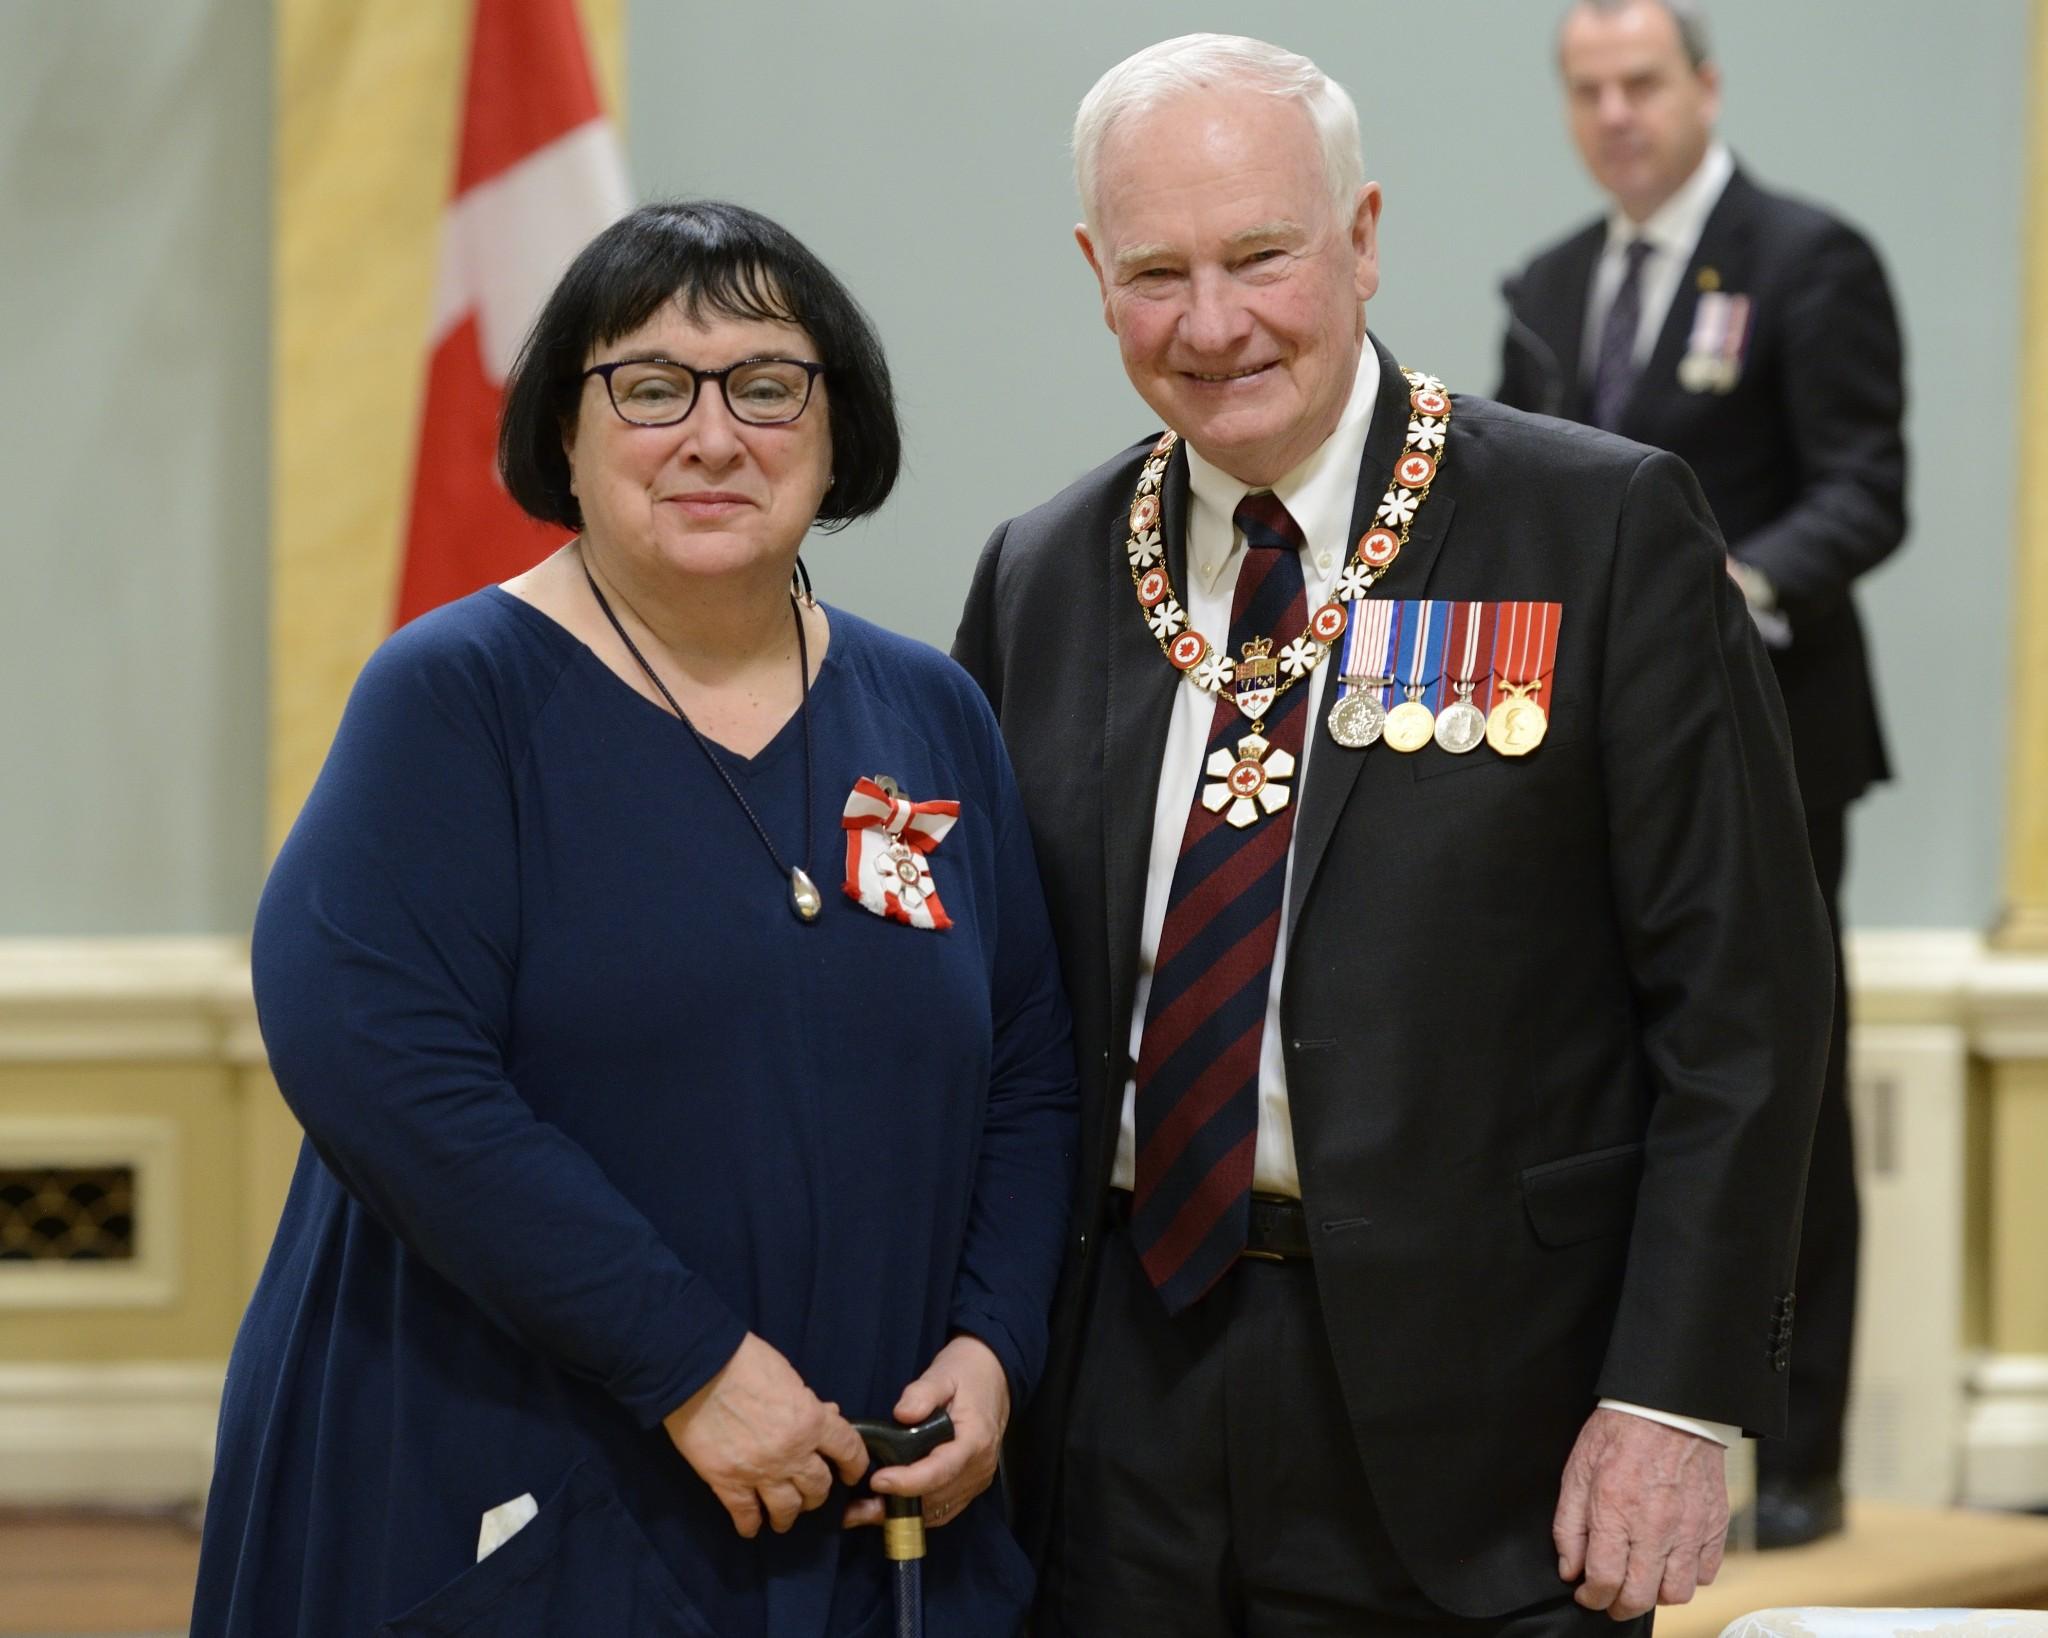 Michèle Fortin reçoit l'insigne de l'Ordre du Canada